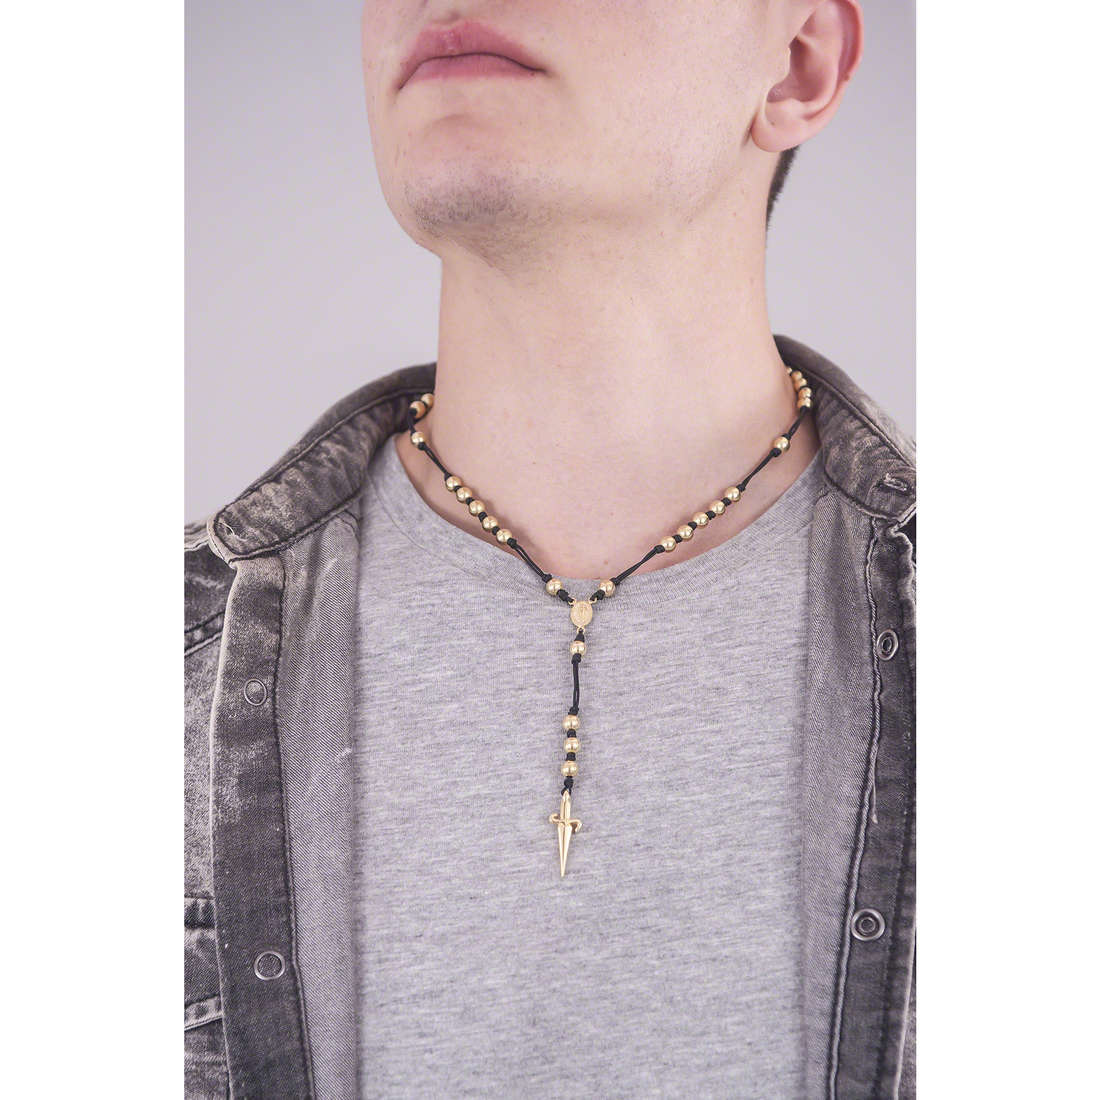 Cesare Paciotti necklaces man JPCL1053G indosso